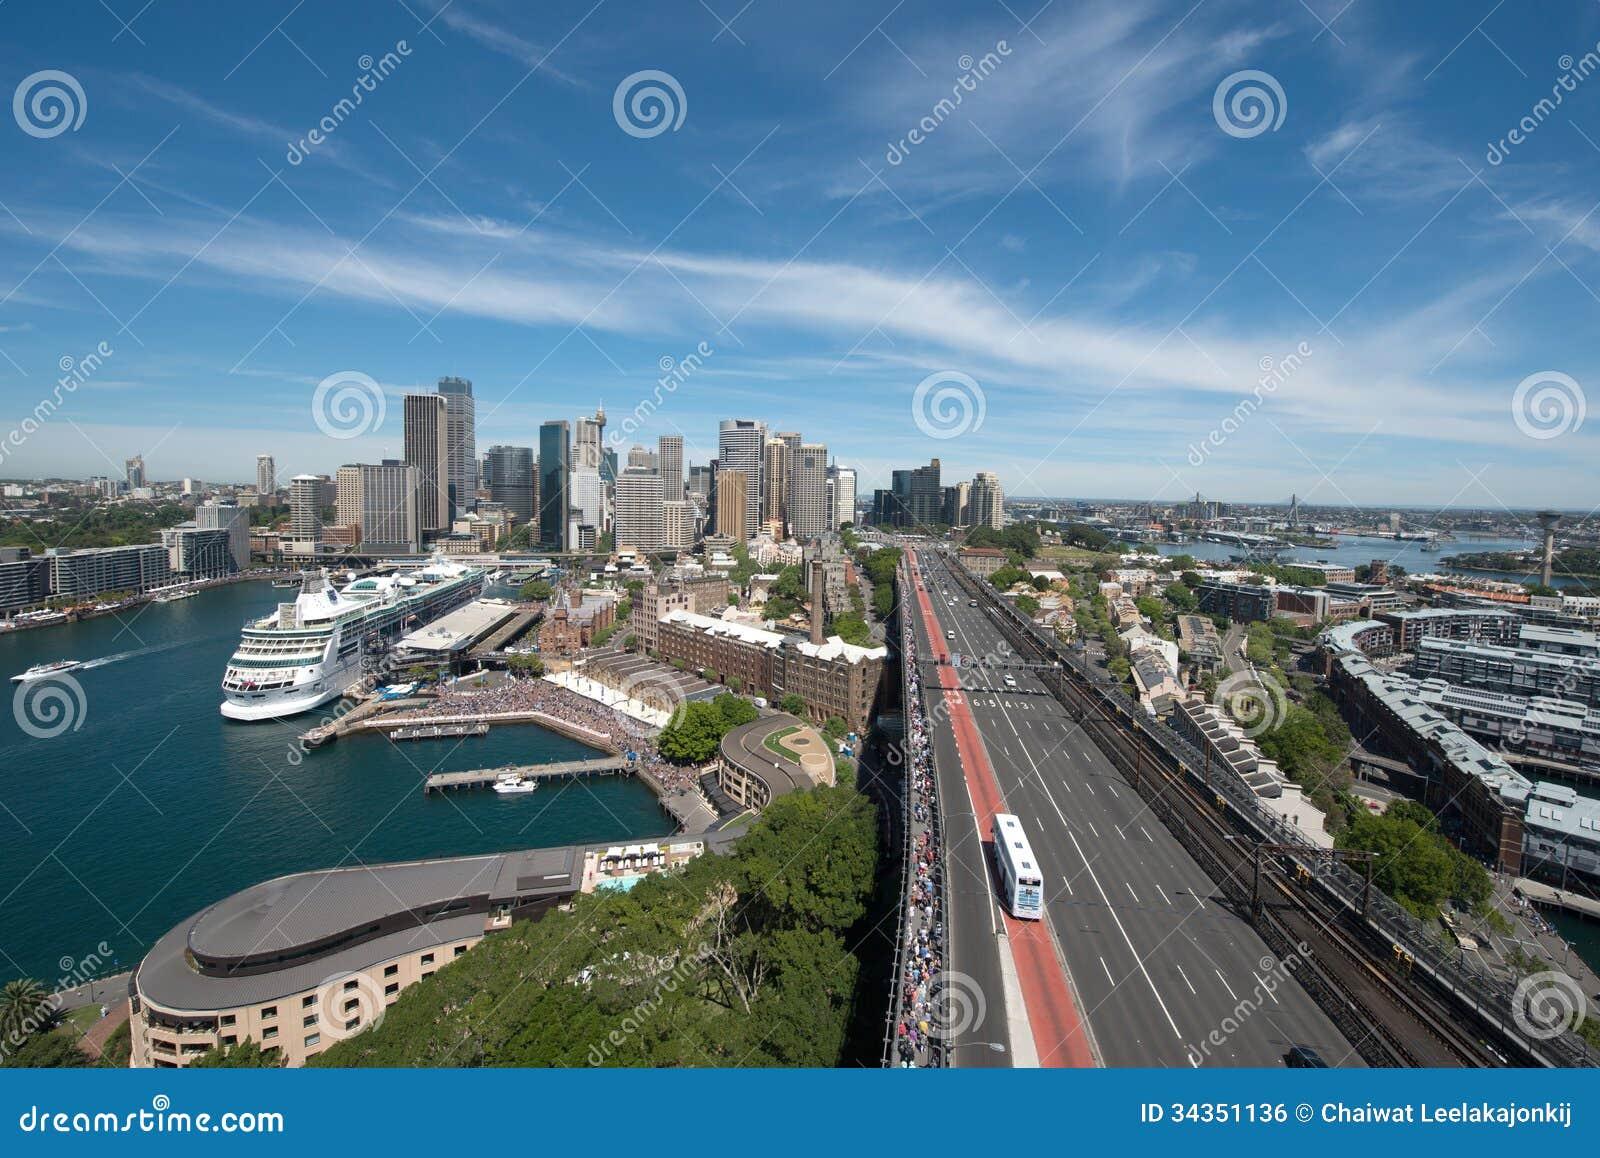 City sex online in Sydney